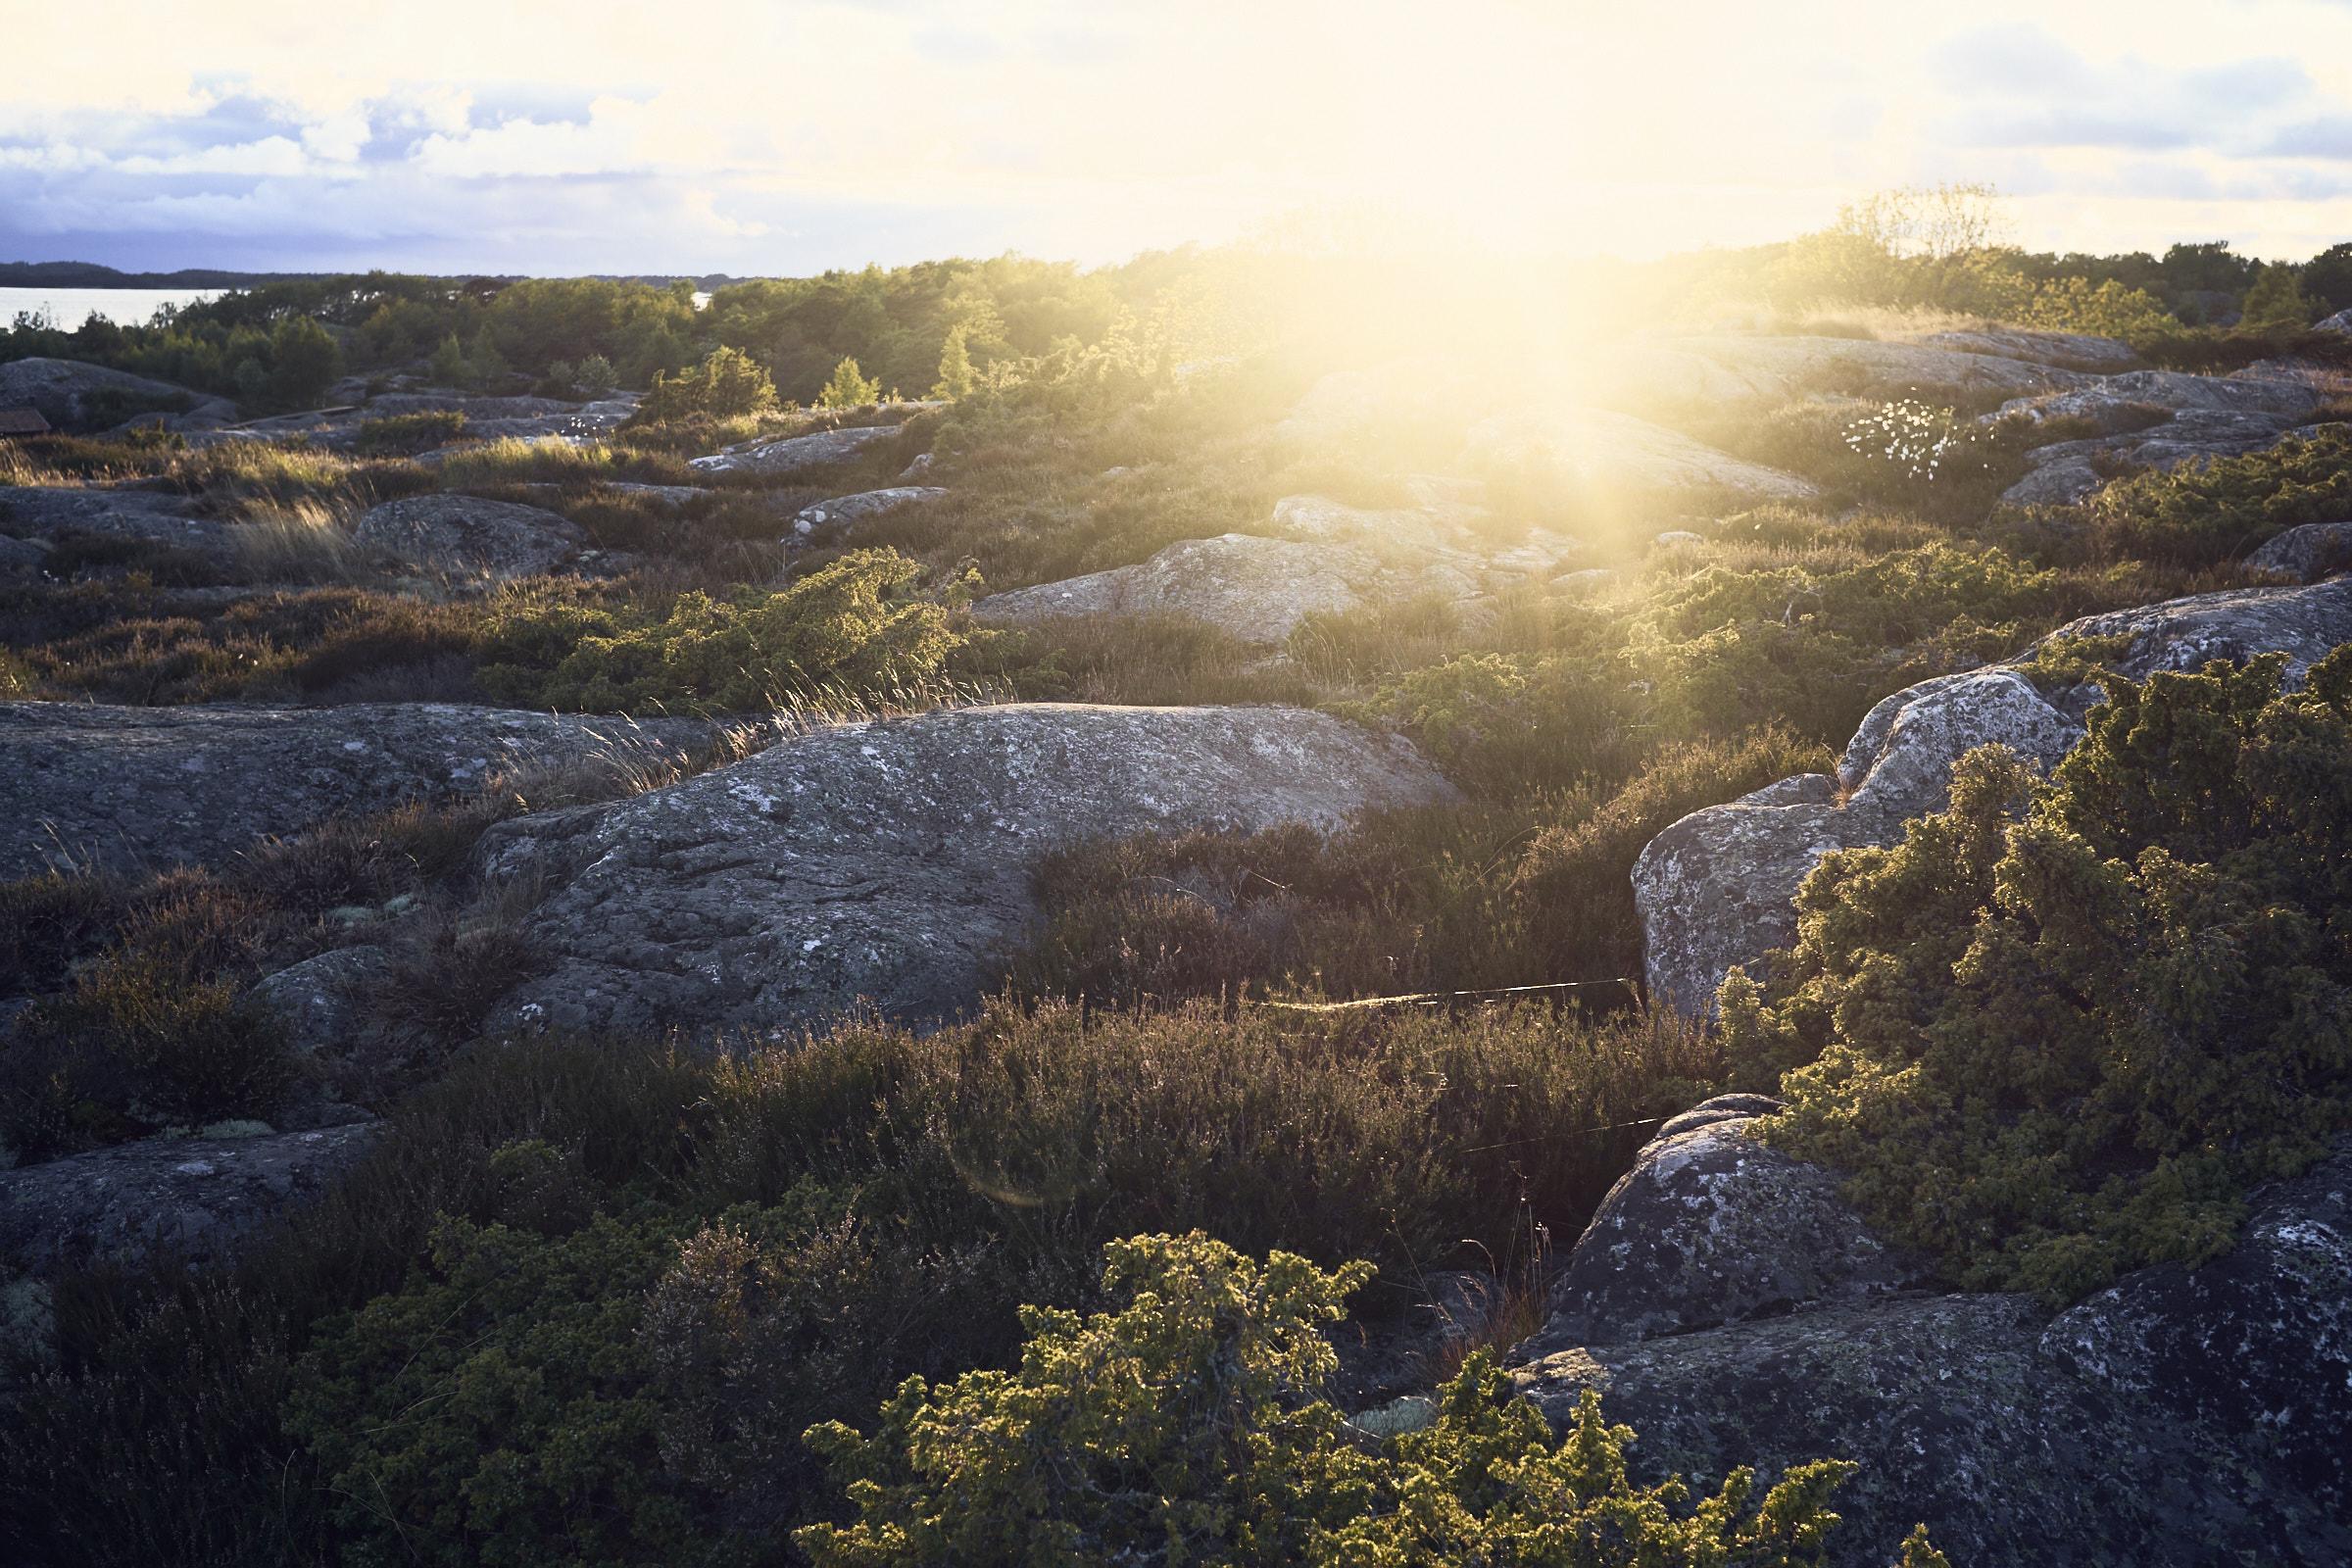 Images Only for RFTB__DSF9325_© Kristofer Samuelsson Photography 2016.jpg